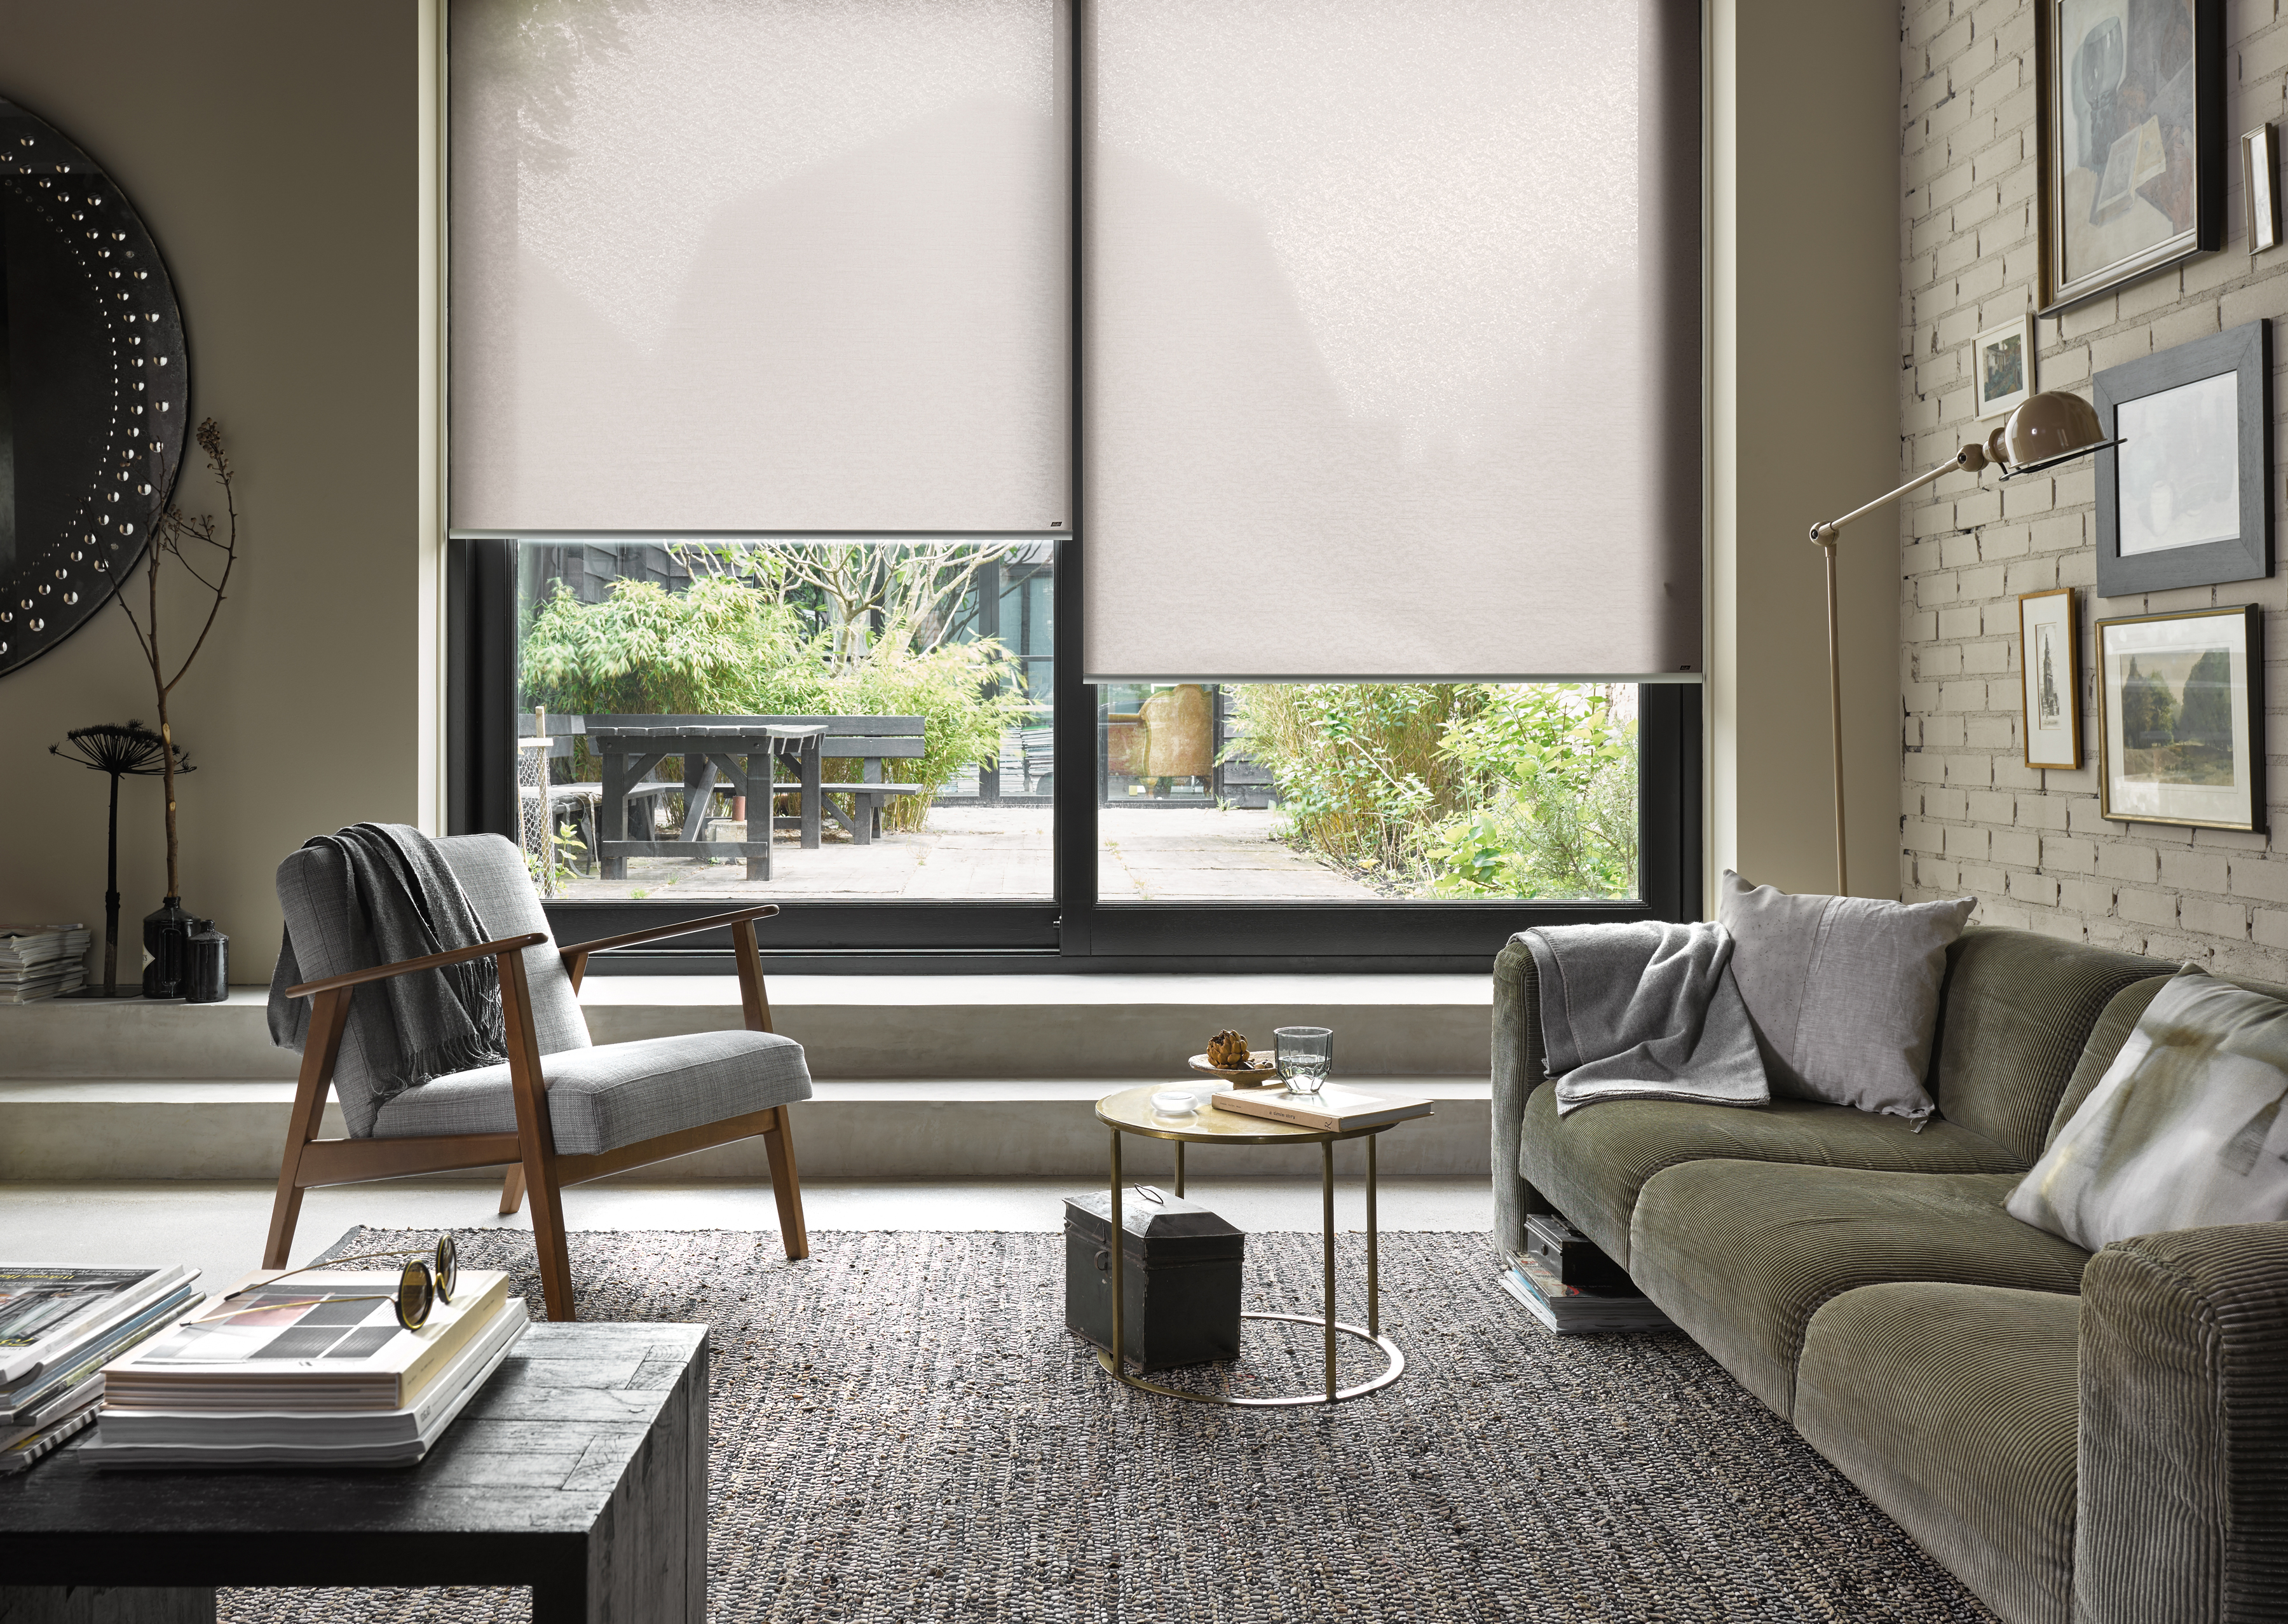 Weathermaster fabric treatments